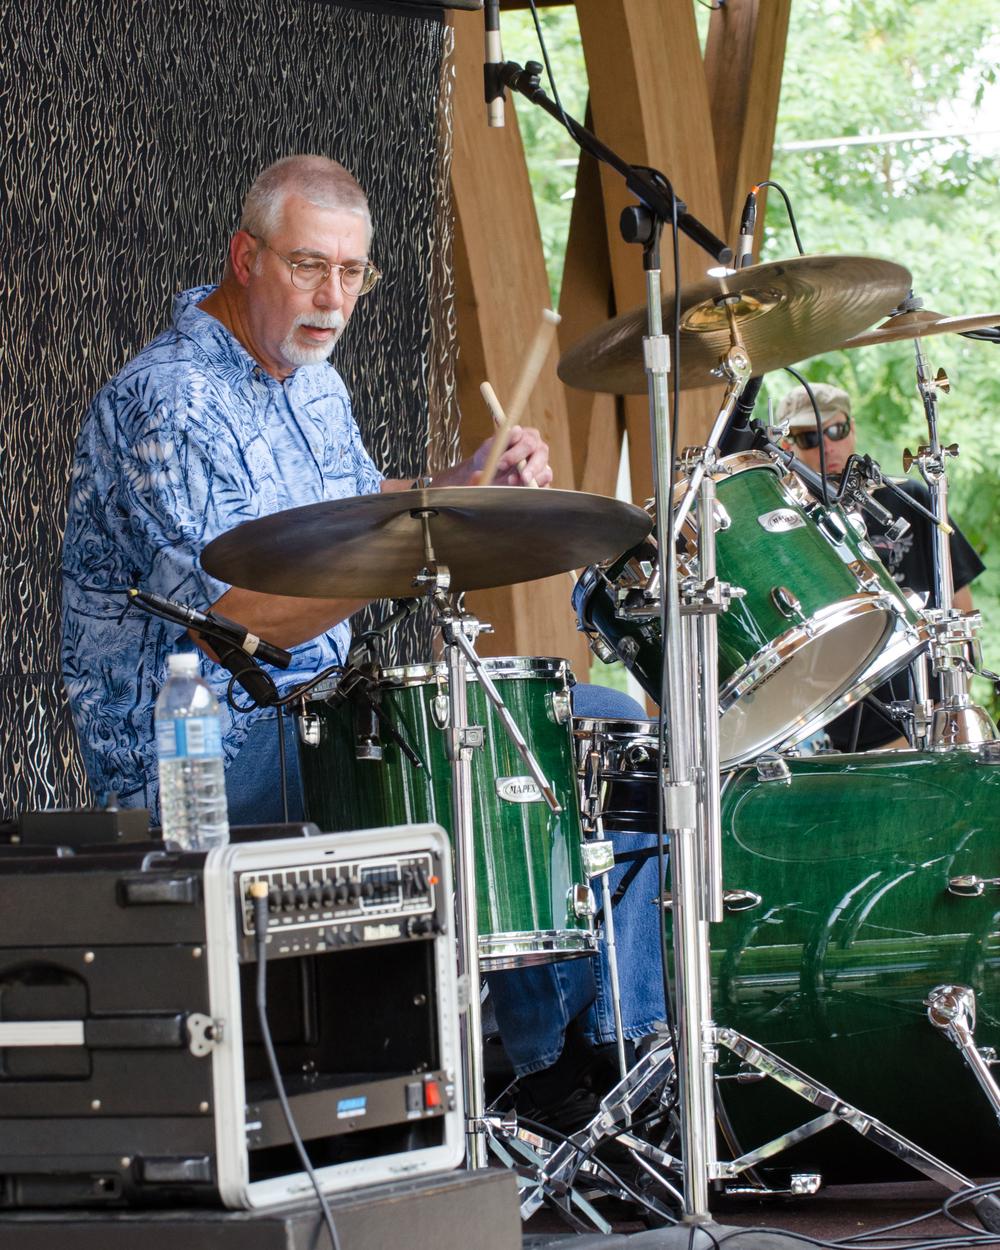 Fleetwood_Blues_Festival_2013-08-11_-34.jpg